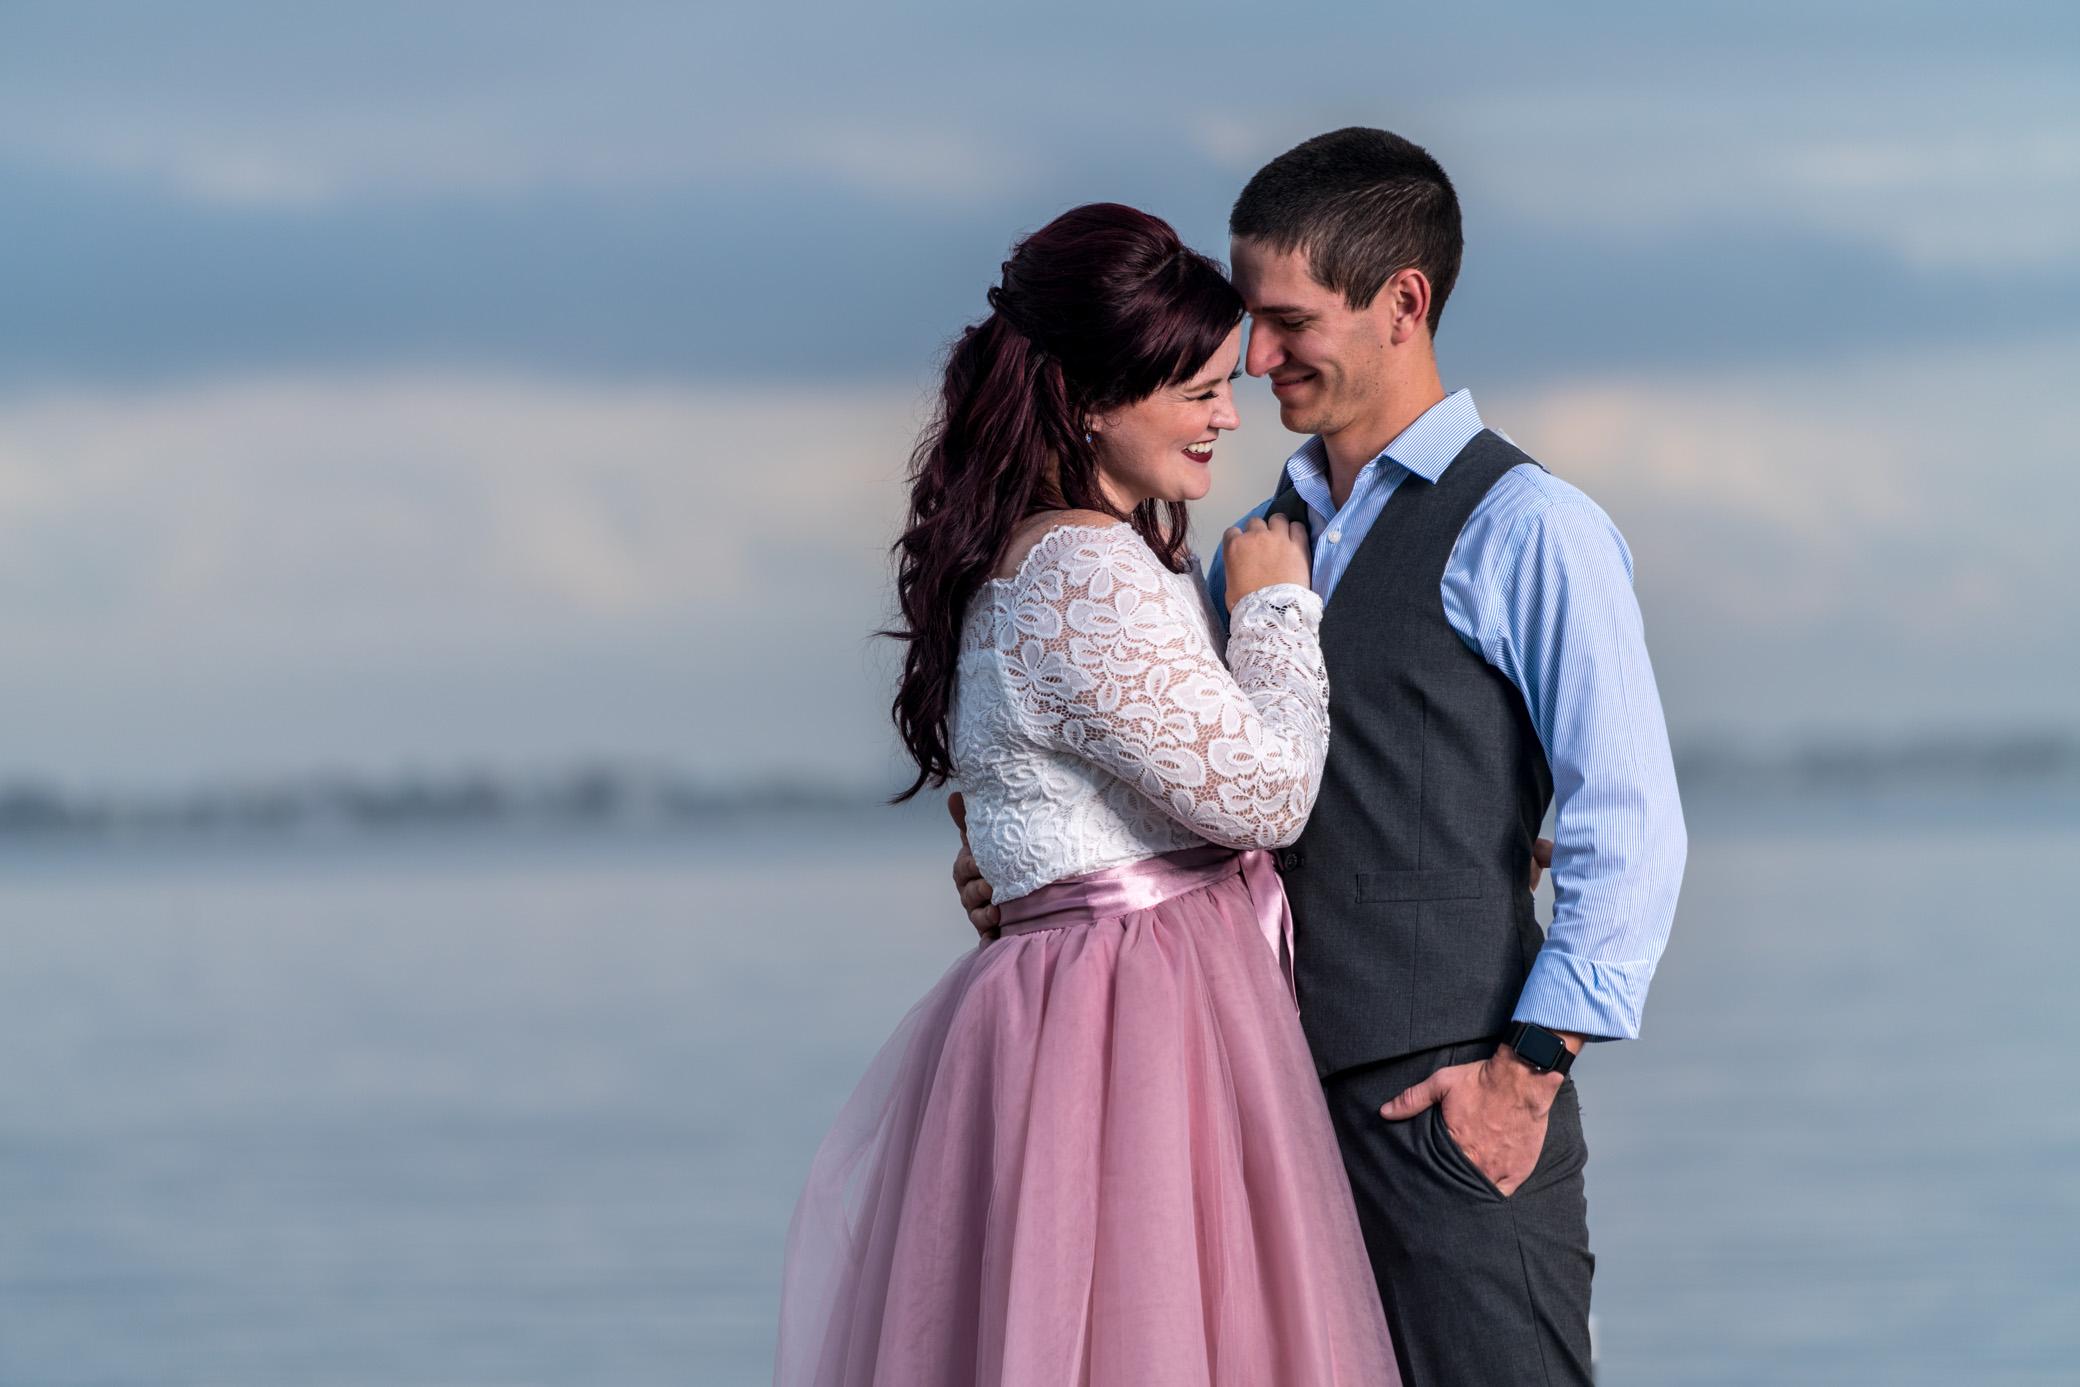 engagement-photography-pensacola-couple.jpg